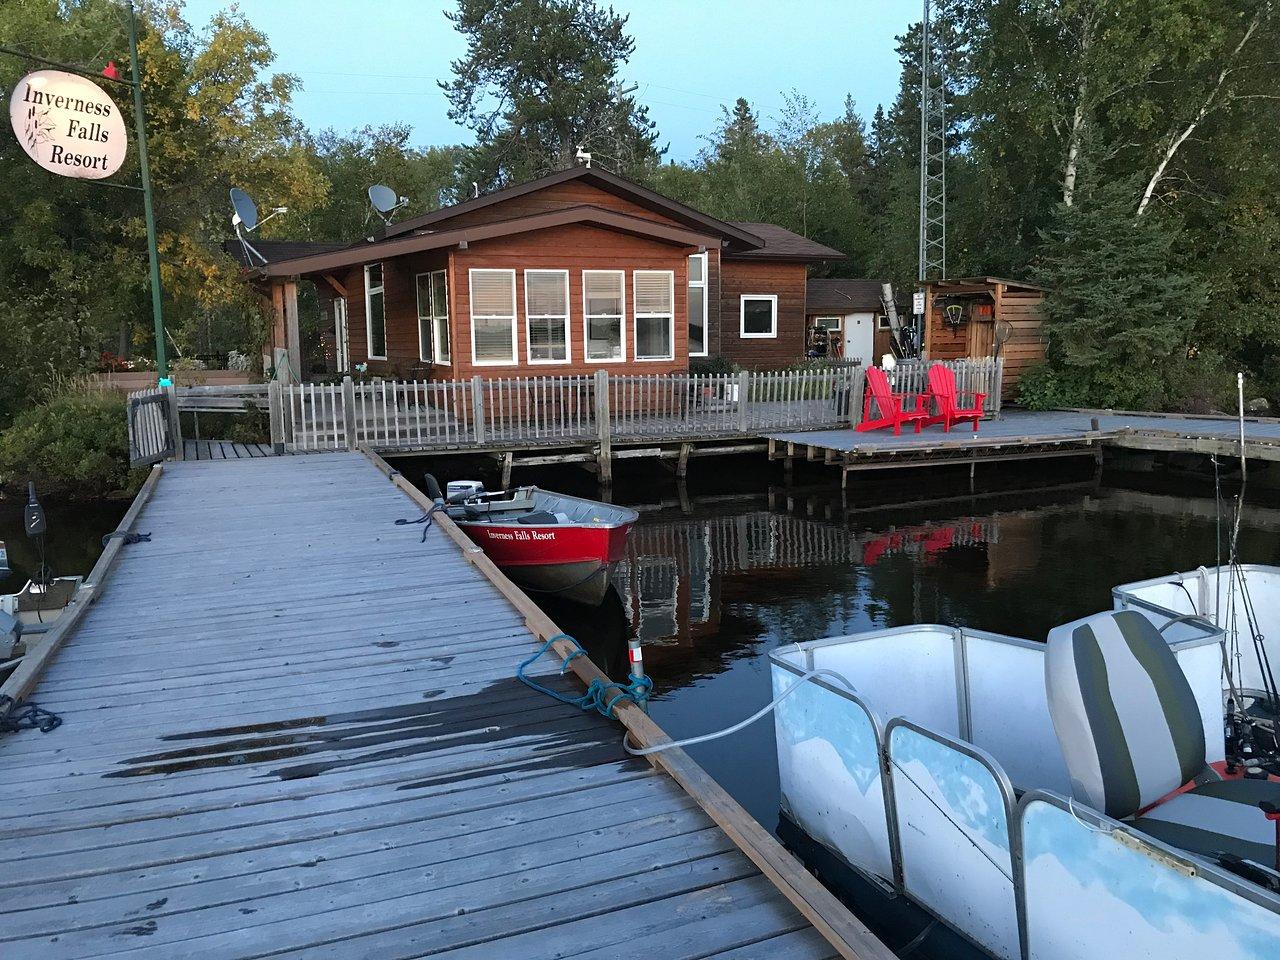 INVERNESS FALLS RESORT - Hotel Reviews (Brereton Lake